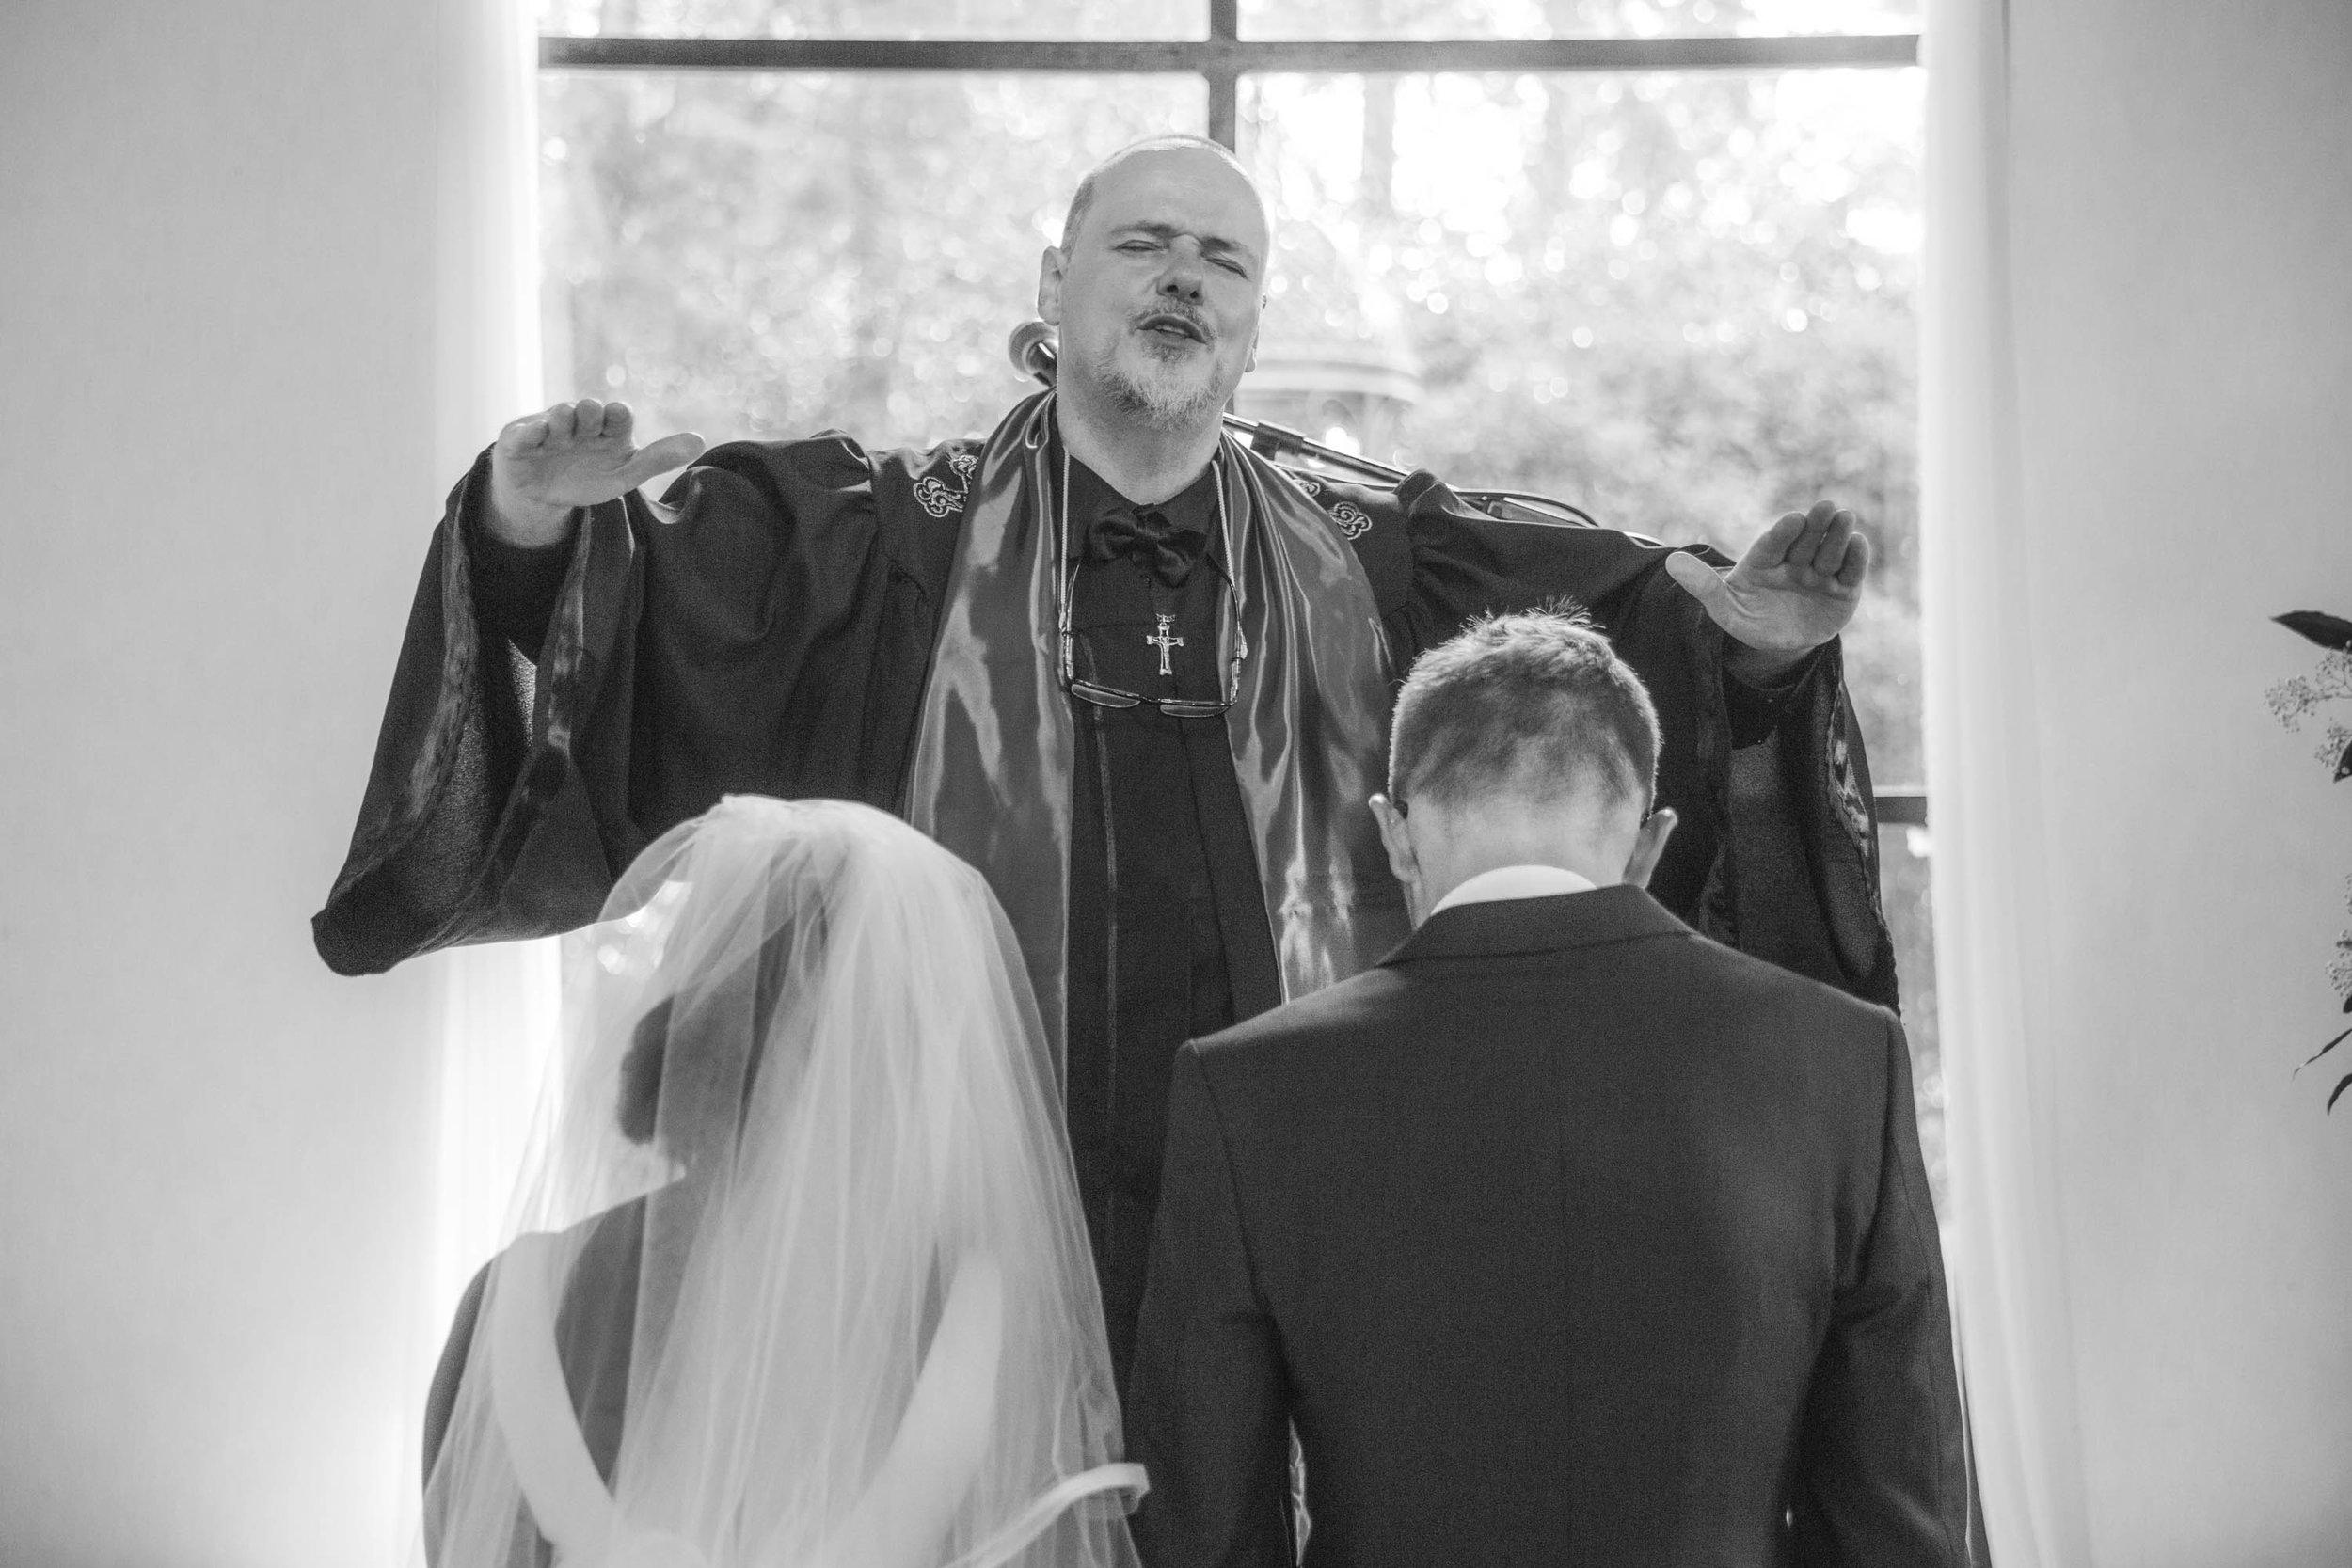 074-wedding-photographers-johannesburg.JPG